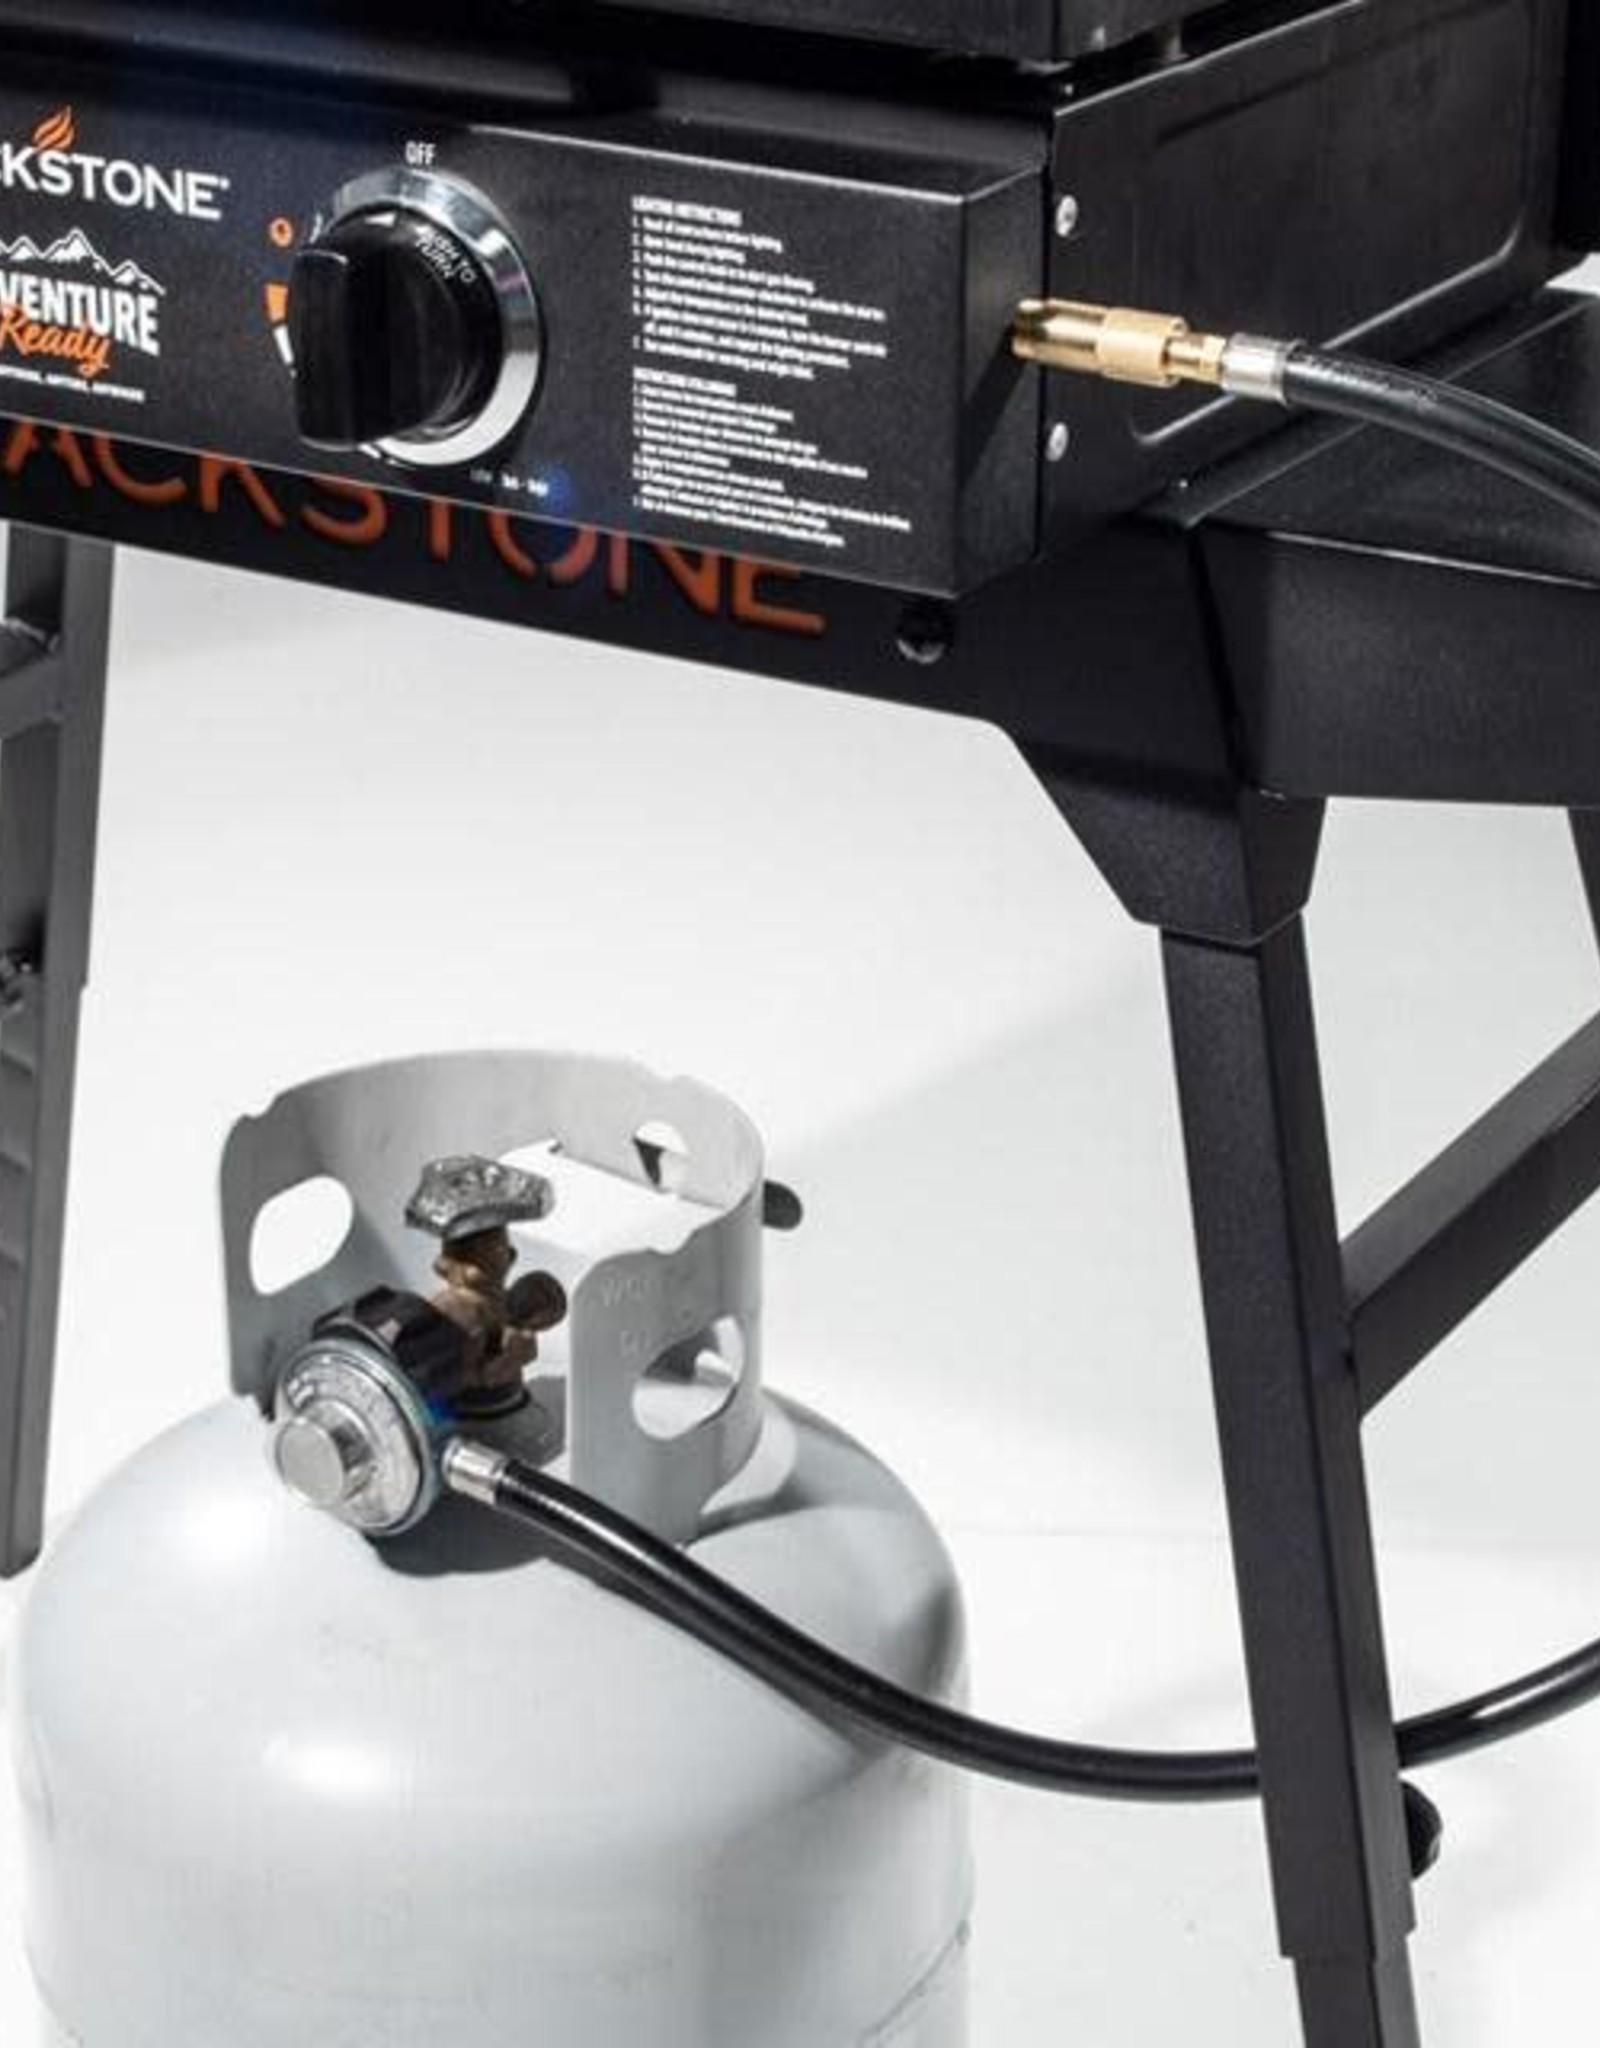 Blackstone Blackstone Propane Adapter Hose with Regulator 5169/5471